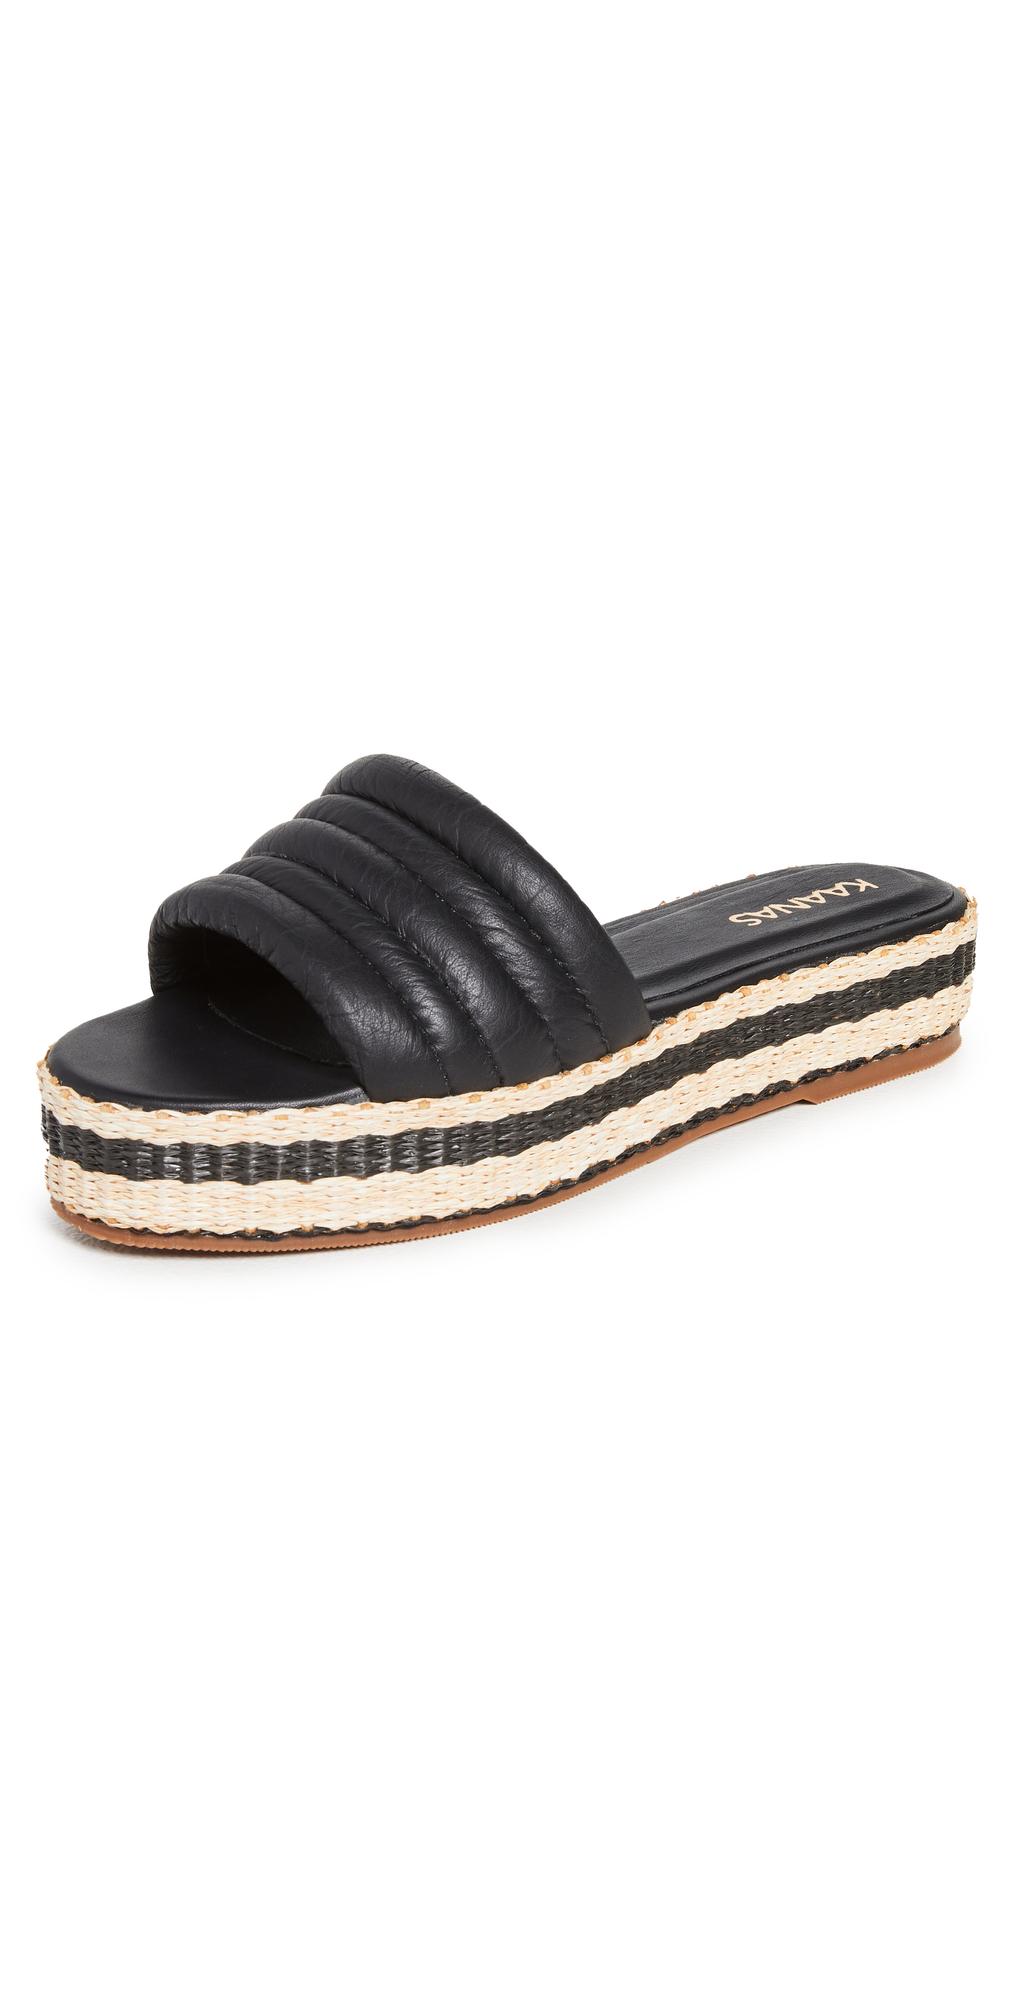 Balfour Chunky Platform Sandals